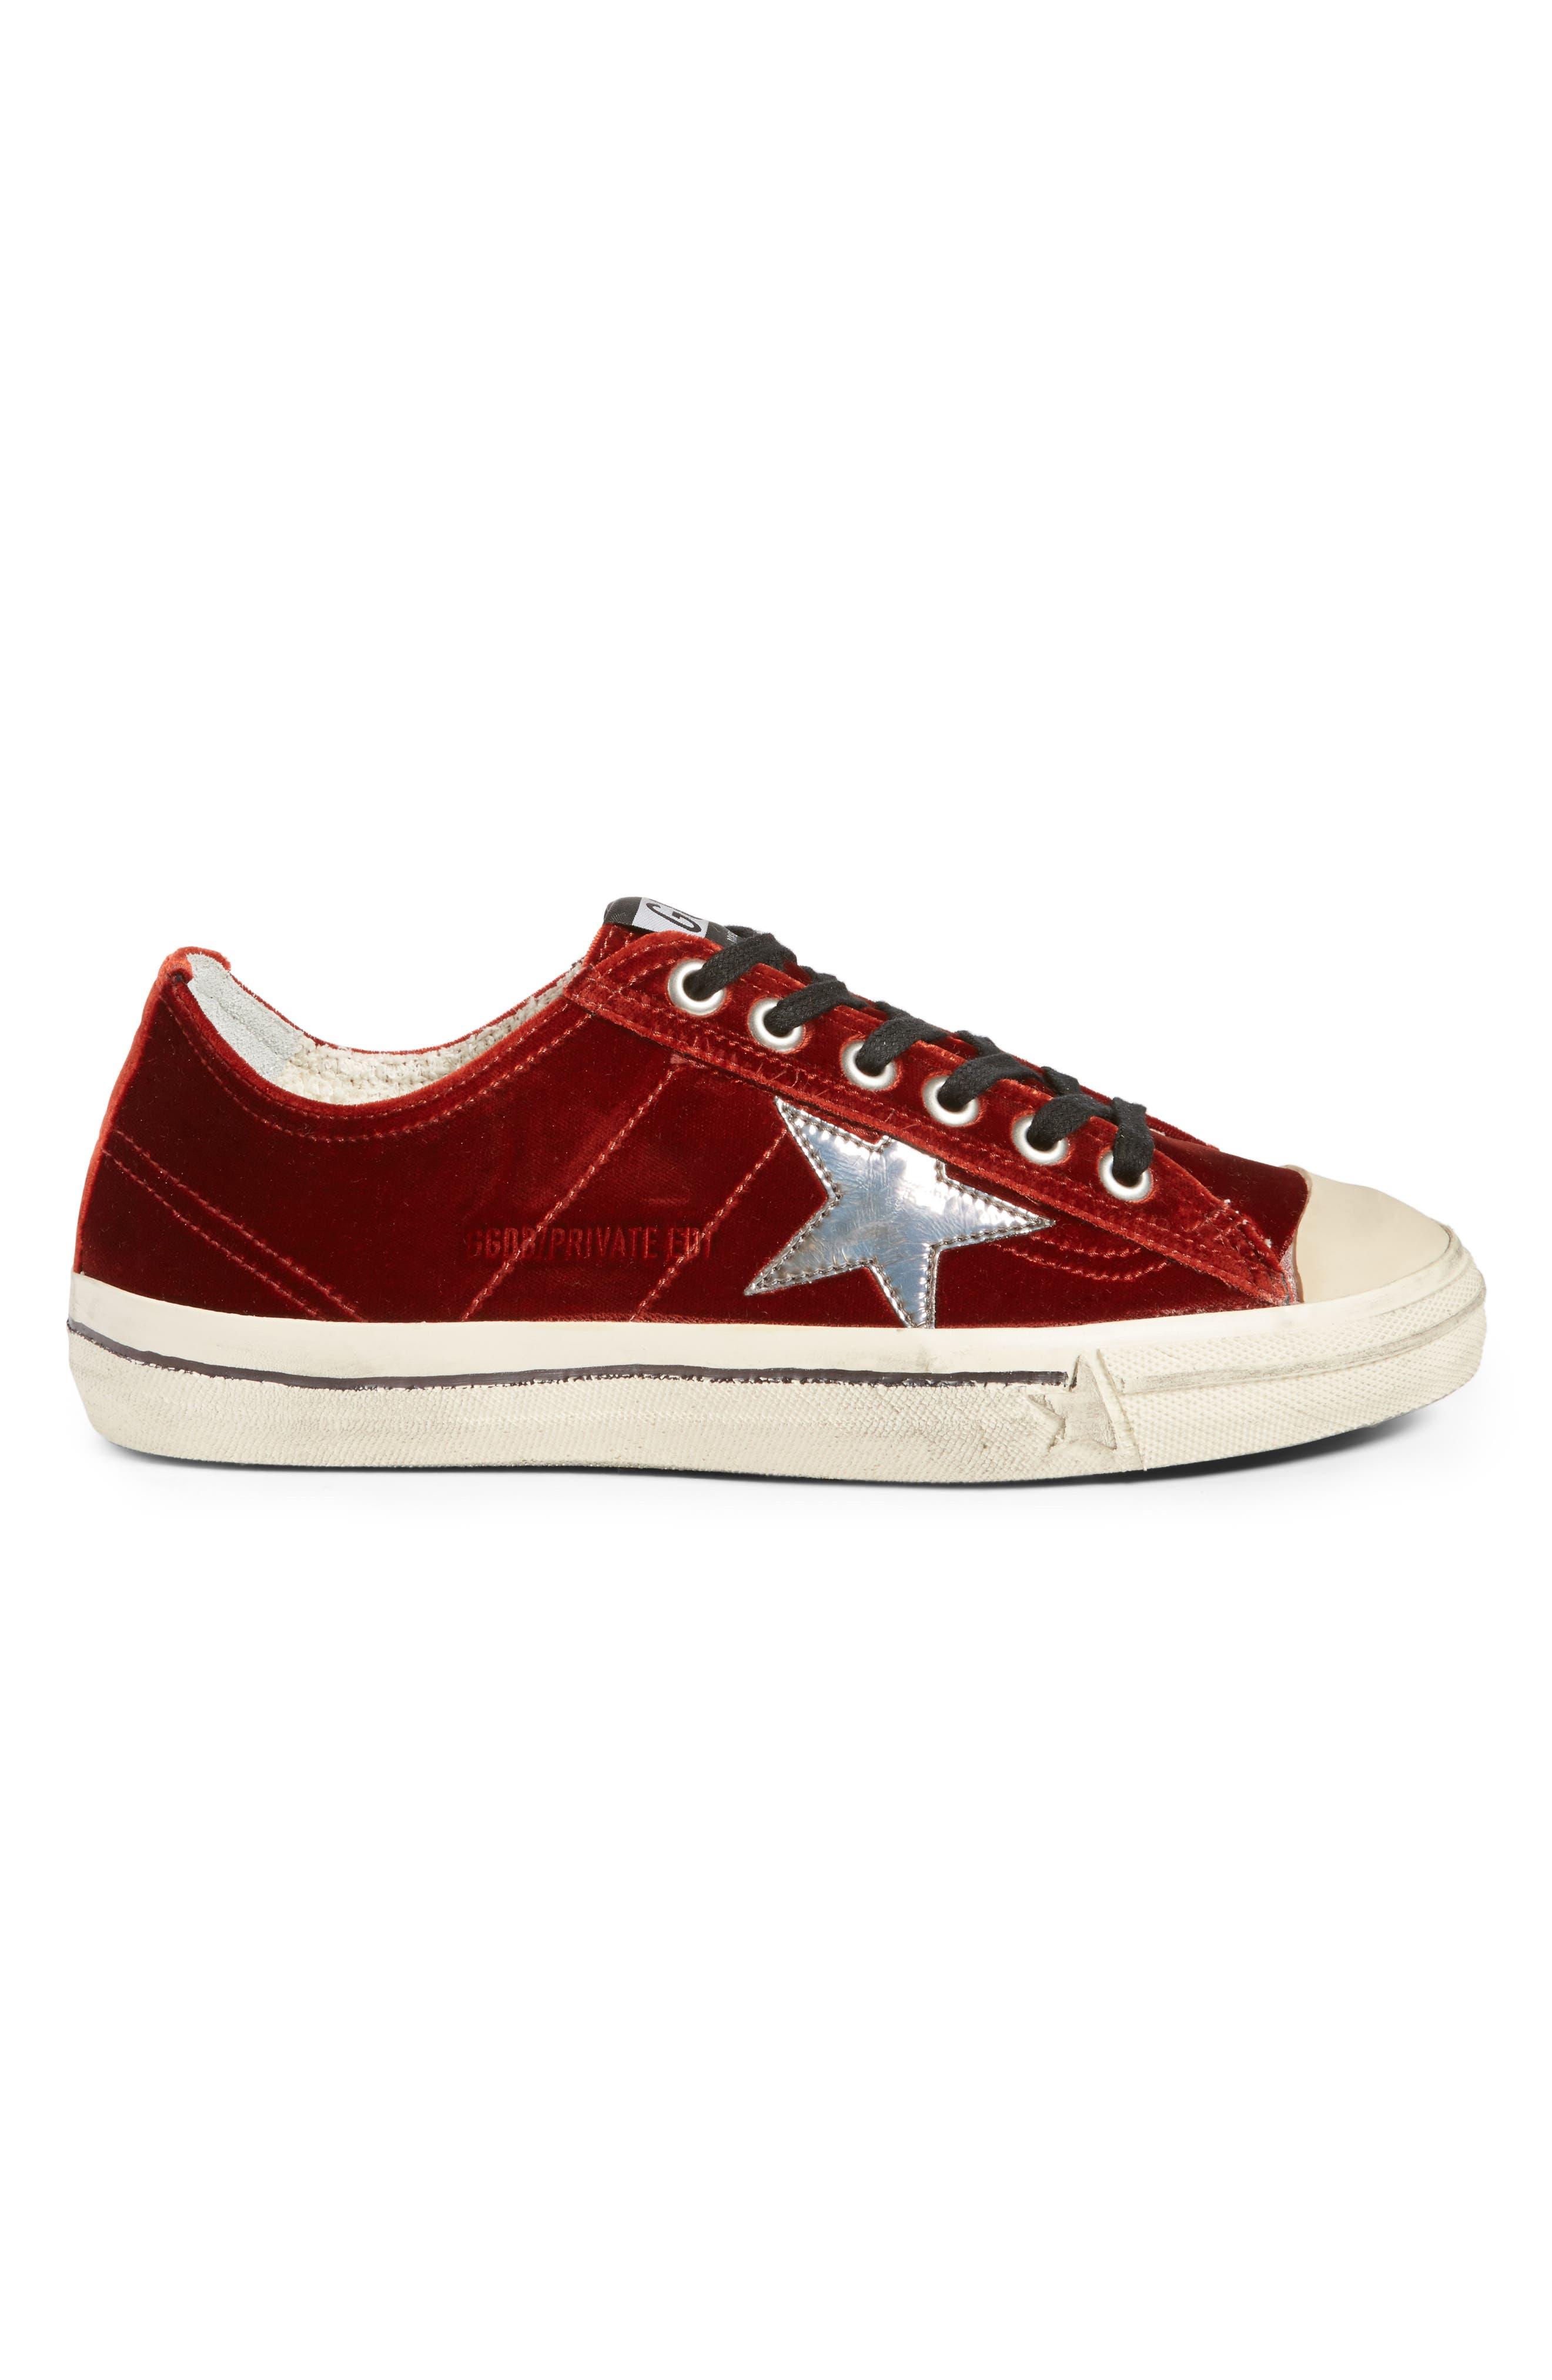 V-Star 2 Low Top Sneaker,                             Alternate thumbnail 3, color,                             930